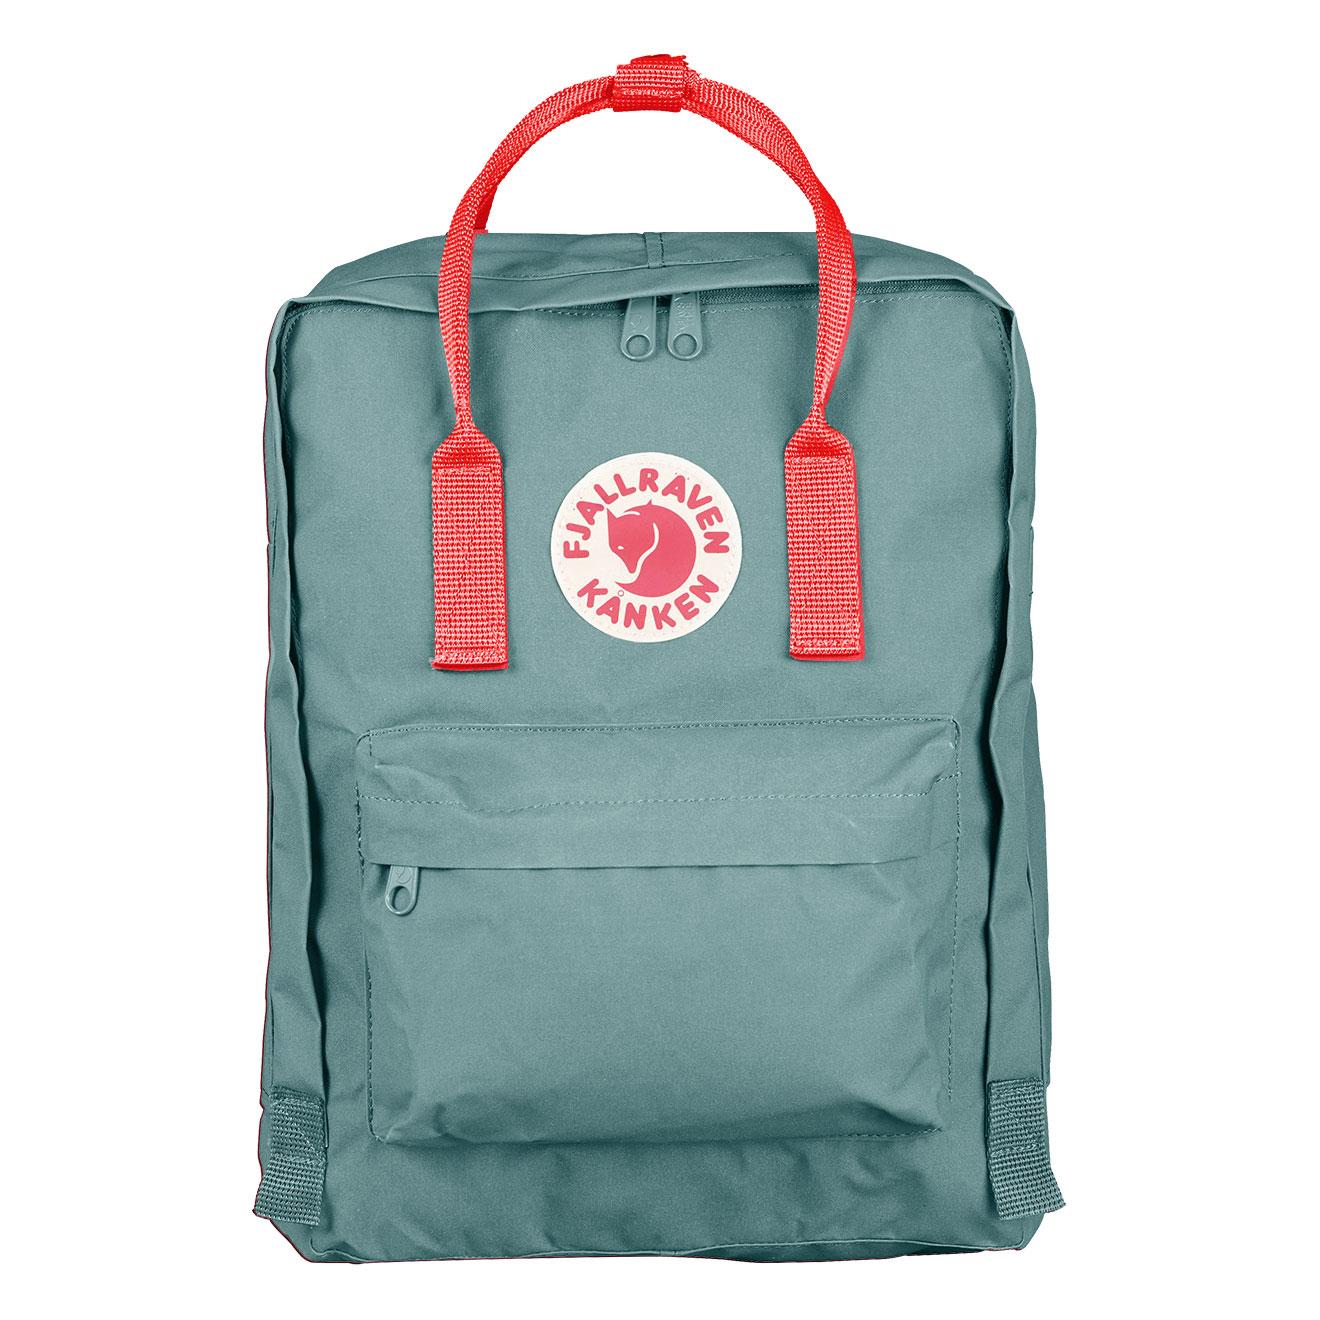 6d69e92679f Fjallraven Kanken Classic Frost Green   Peach Pink - Retro Bags